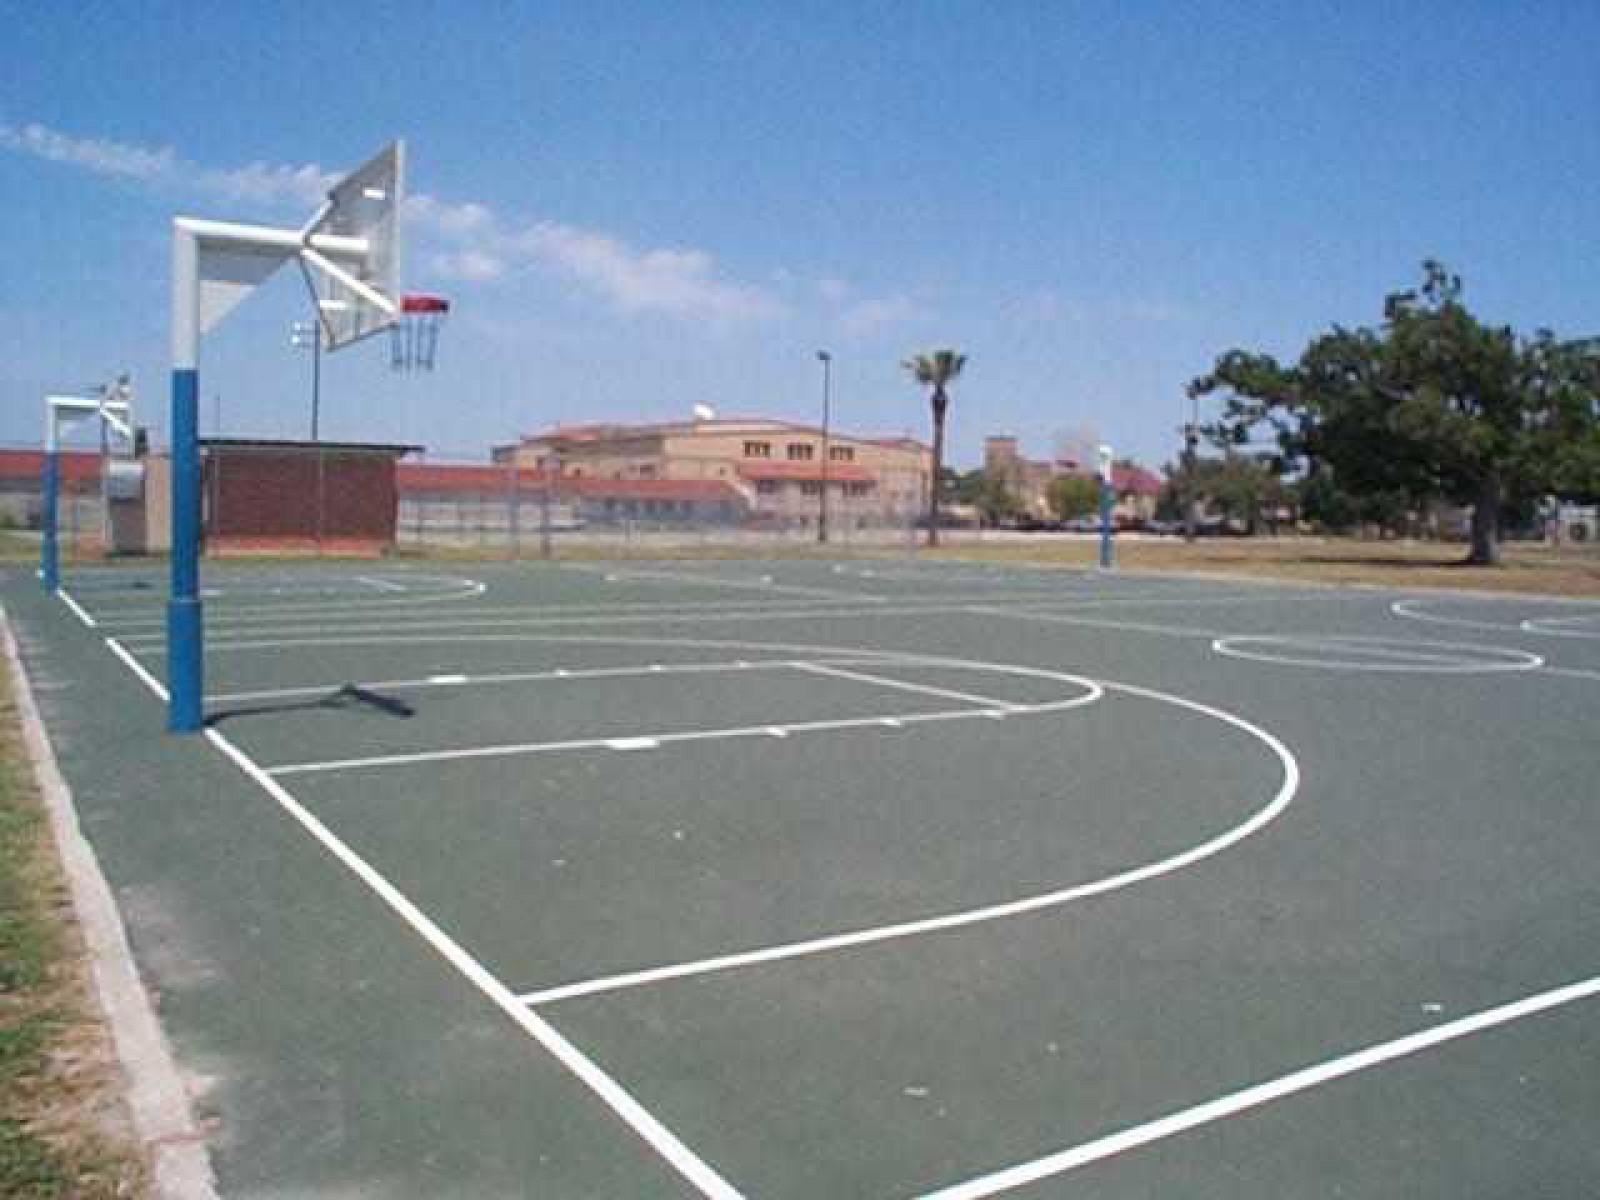 San Antonio Tx Basketball Court Pittman Sullivan Park Courts Of The World